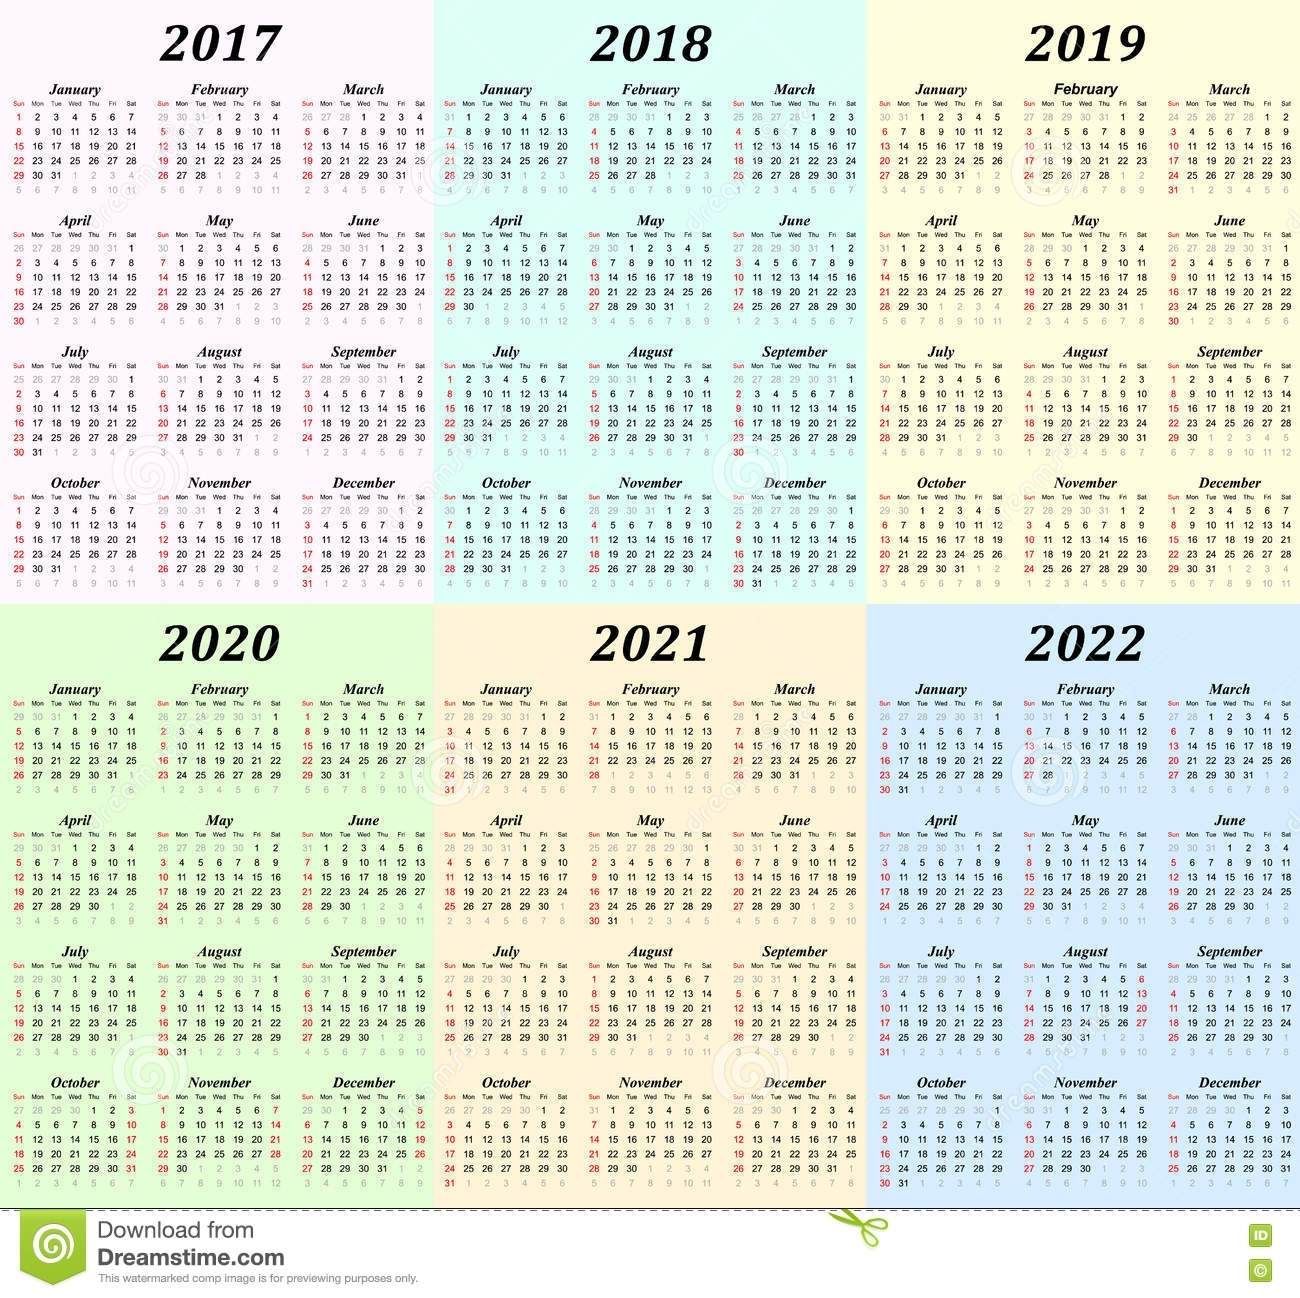 Six Year Calendar - 2017, 2018, 2019, 2020, 2021 And 2022